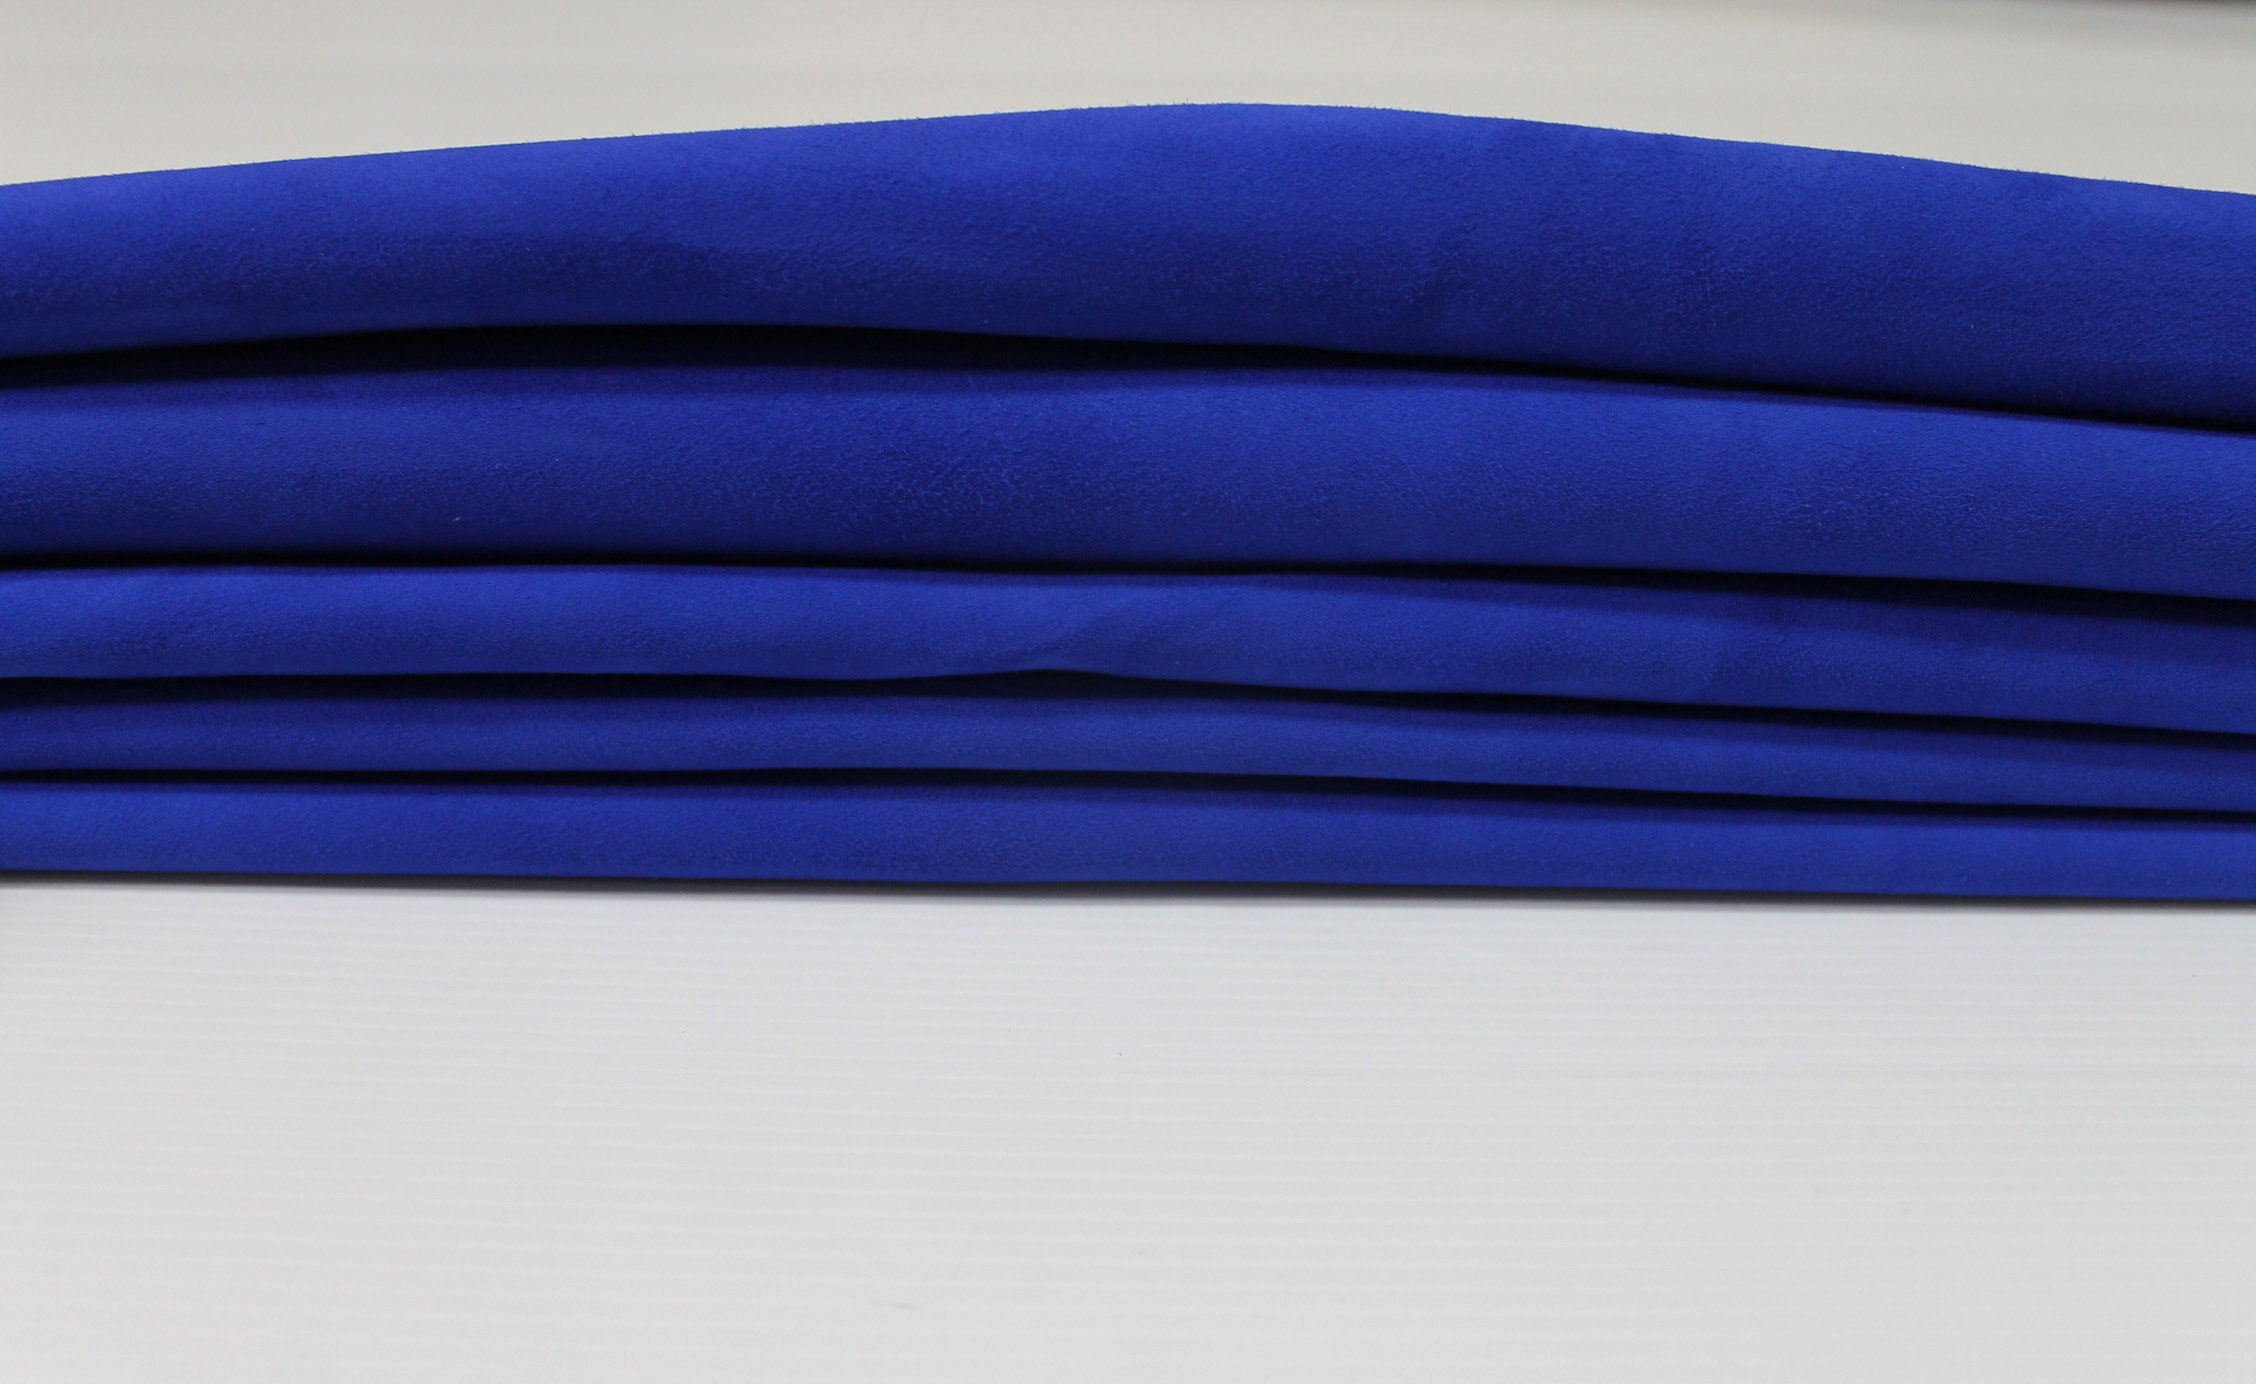 b738aef8f413 ROYAL BLUE SUEDE Italian genuine Lambskin Lamb Sheep leather ...